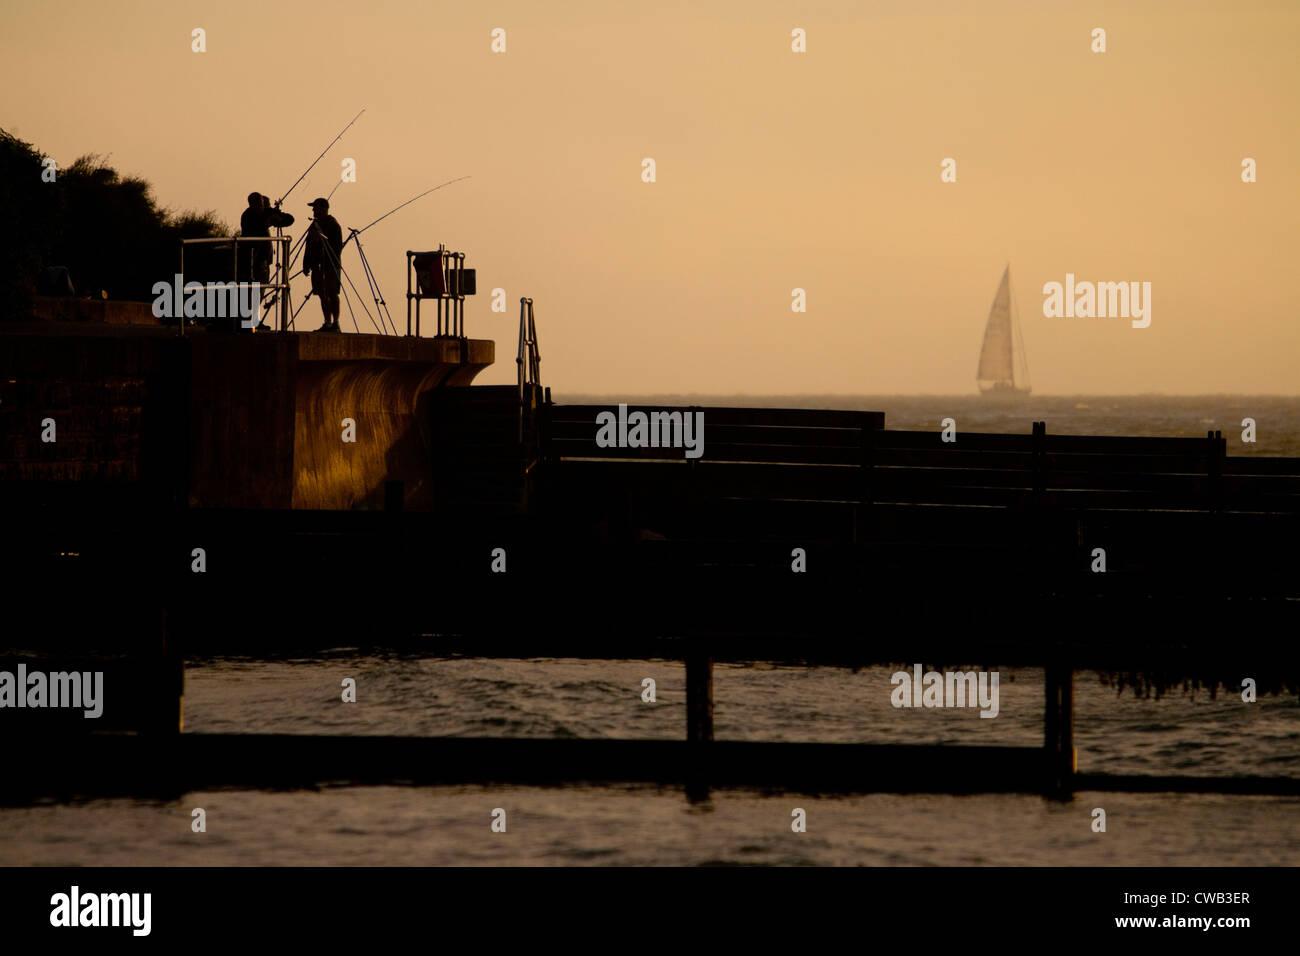 Angling, Fishing, Fishermen, Seawall, groynes, yacht, mist, Colwell Bay, Isle of Wight, England, UK, - Stock Image